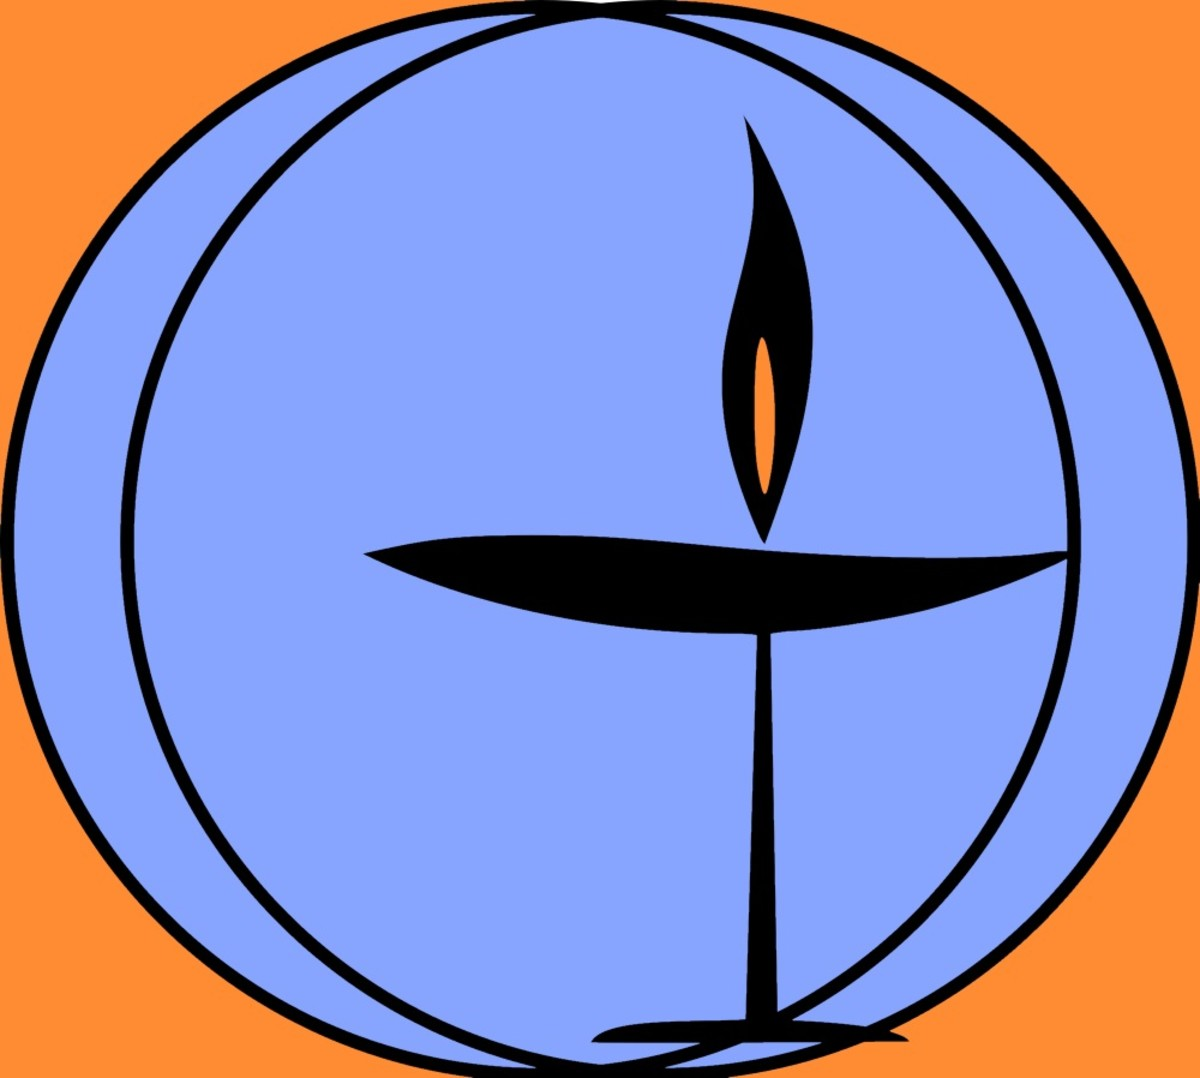 Flaming Chalice - UU Symbol